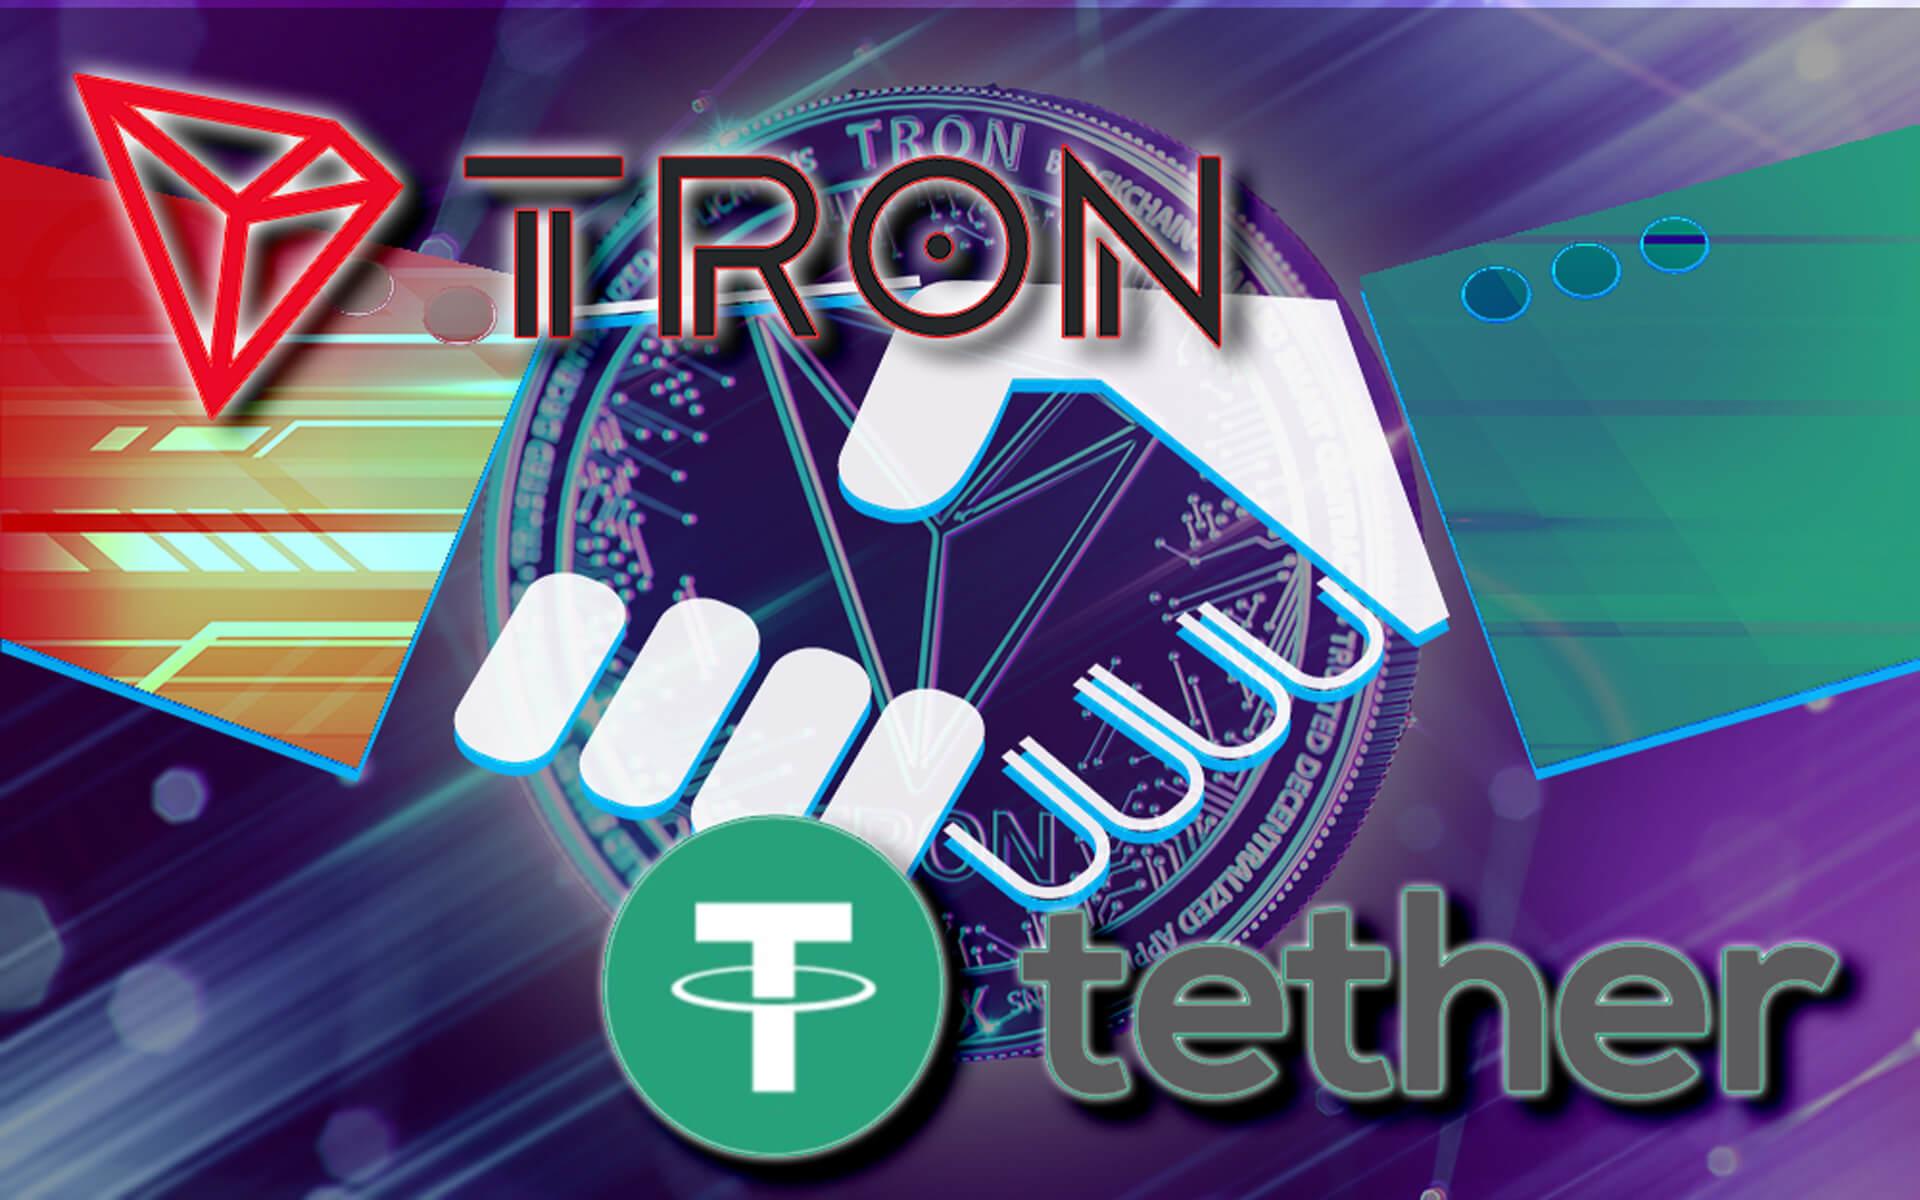 tron-logo-on-coin-troncoin-modern-futuristic-design-partnership-with-tether-hand-shake